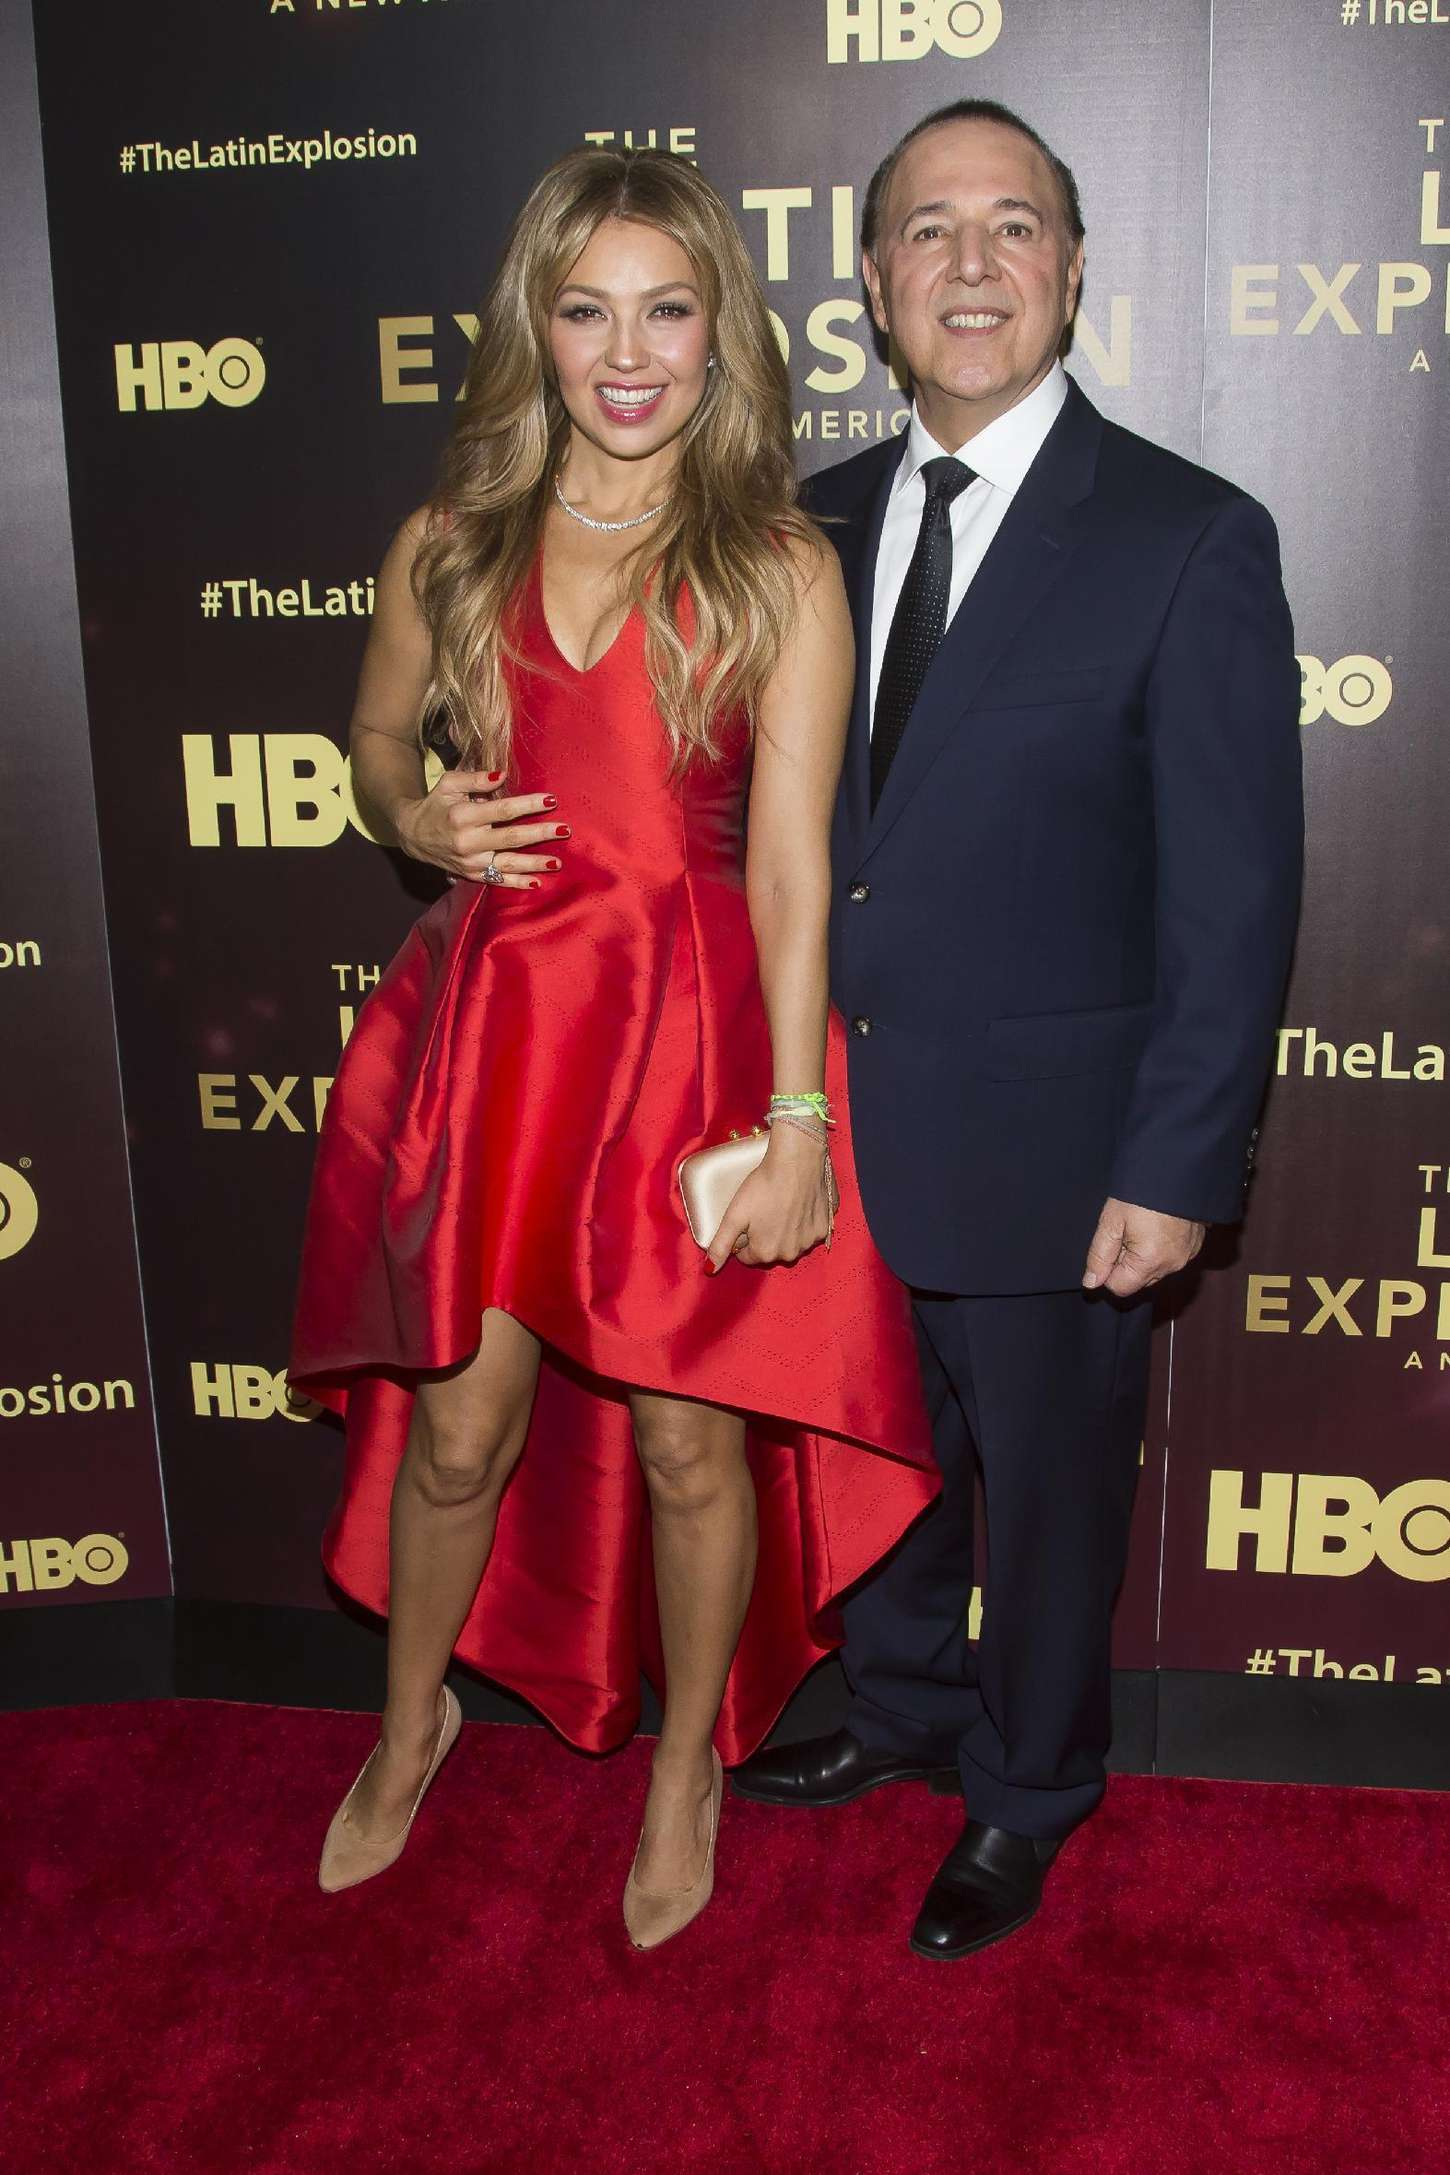 Thalia The Latin Explosion A New America Premiere in New York